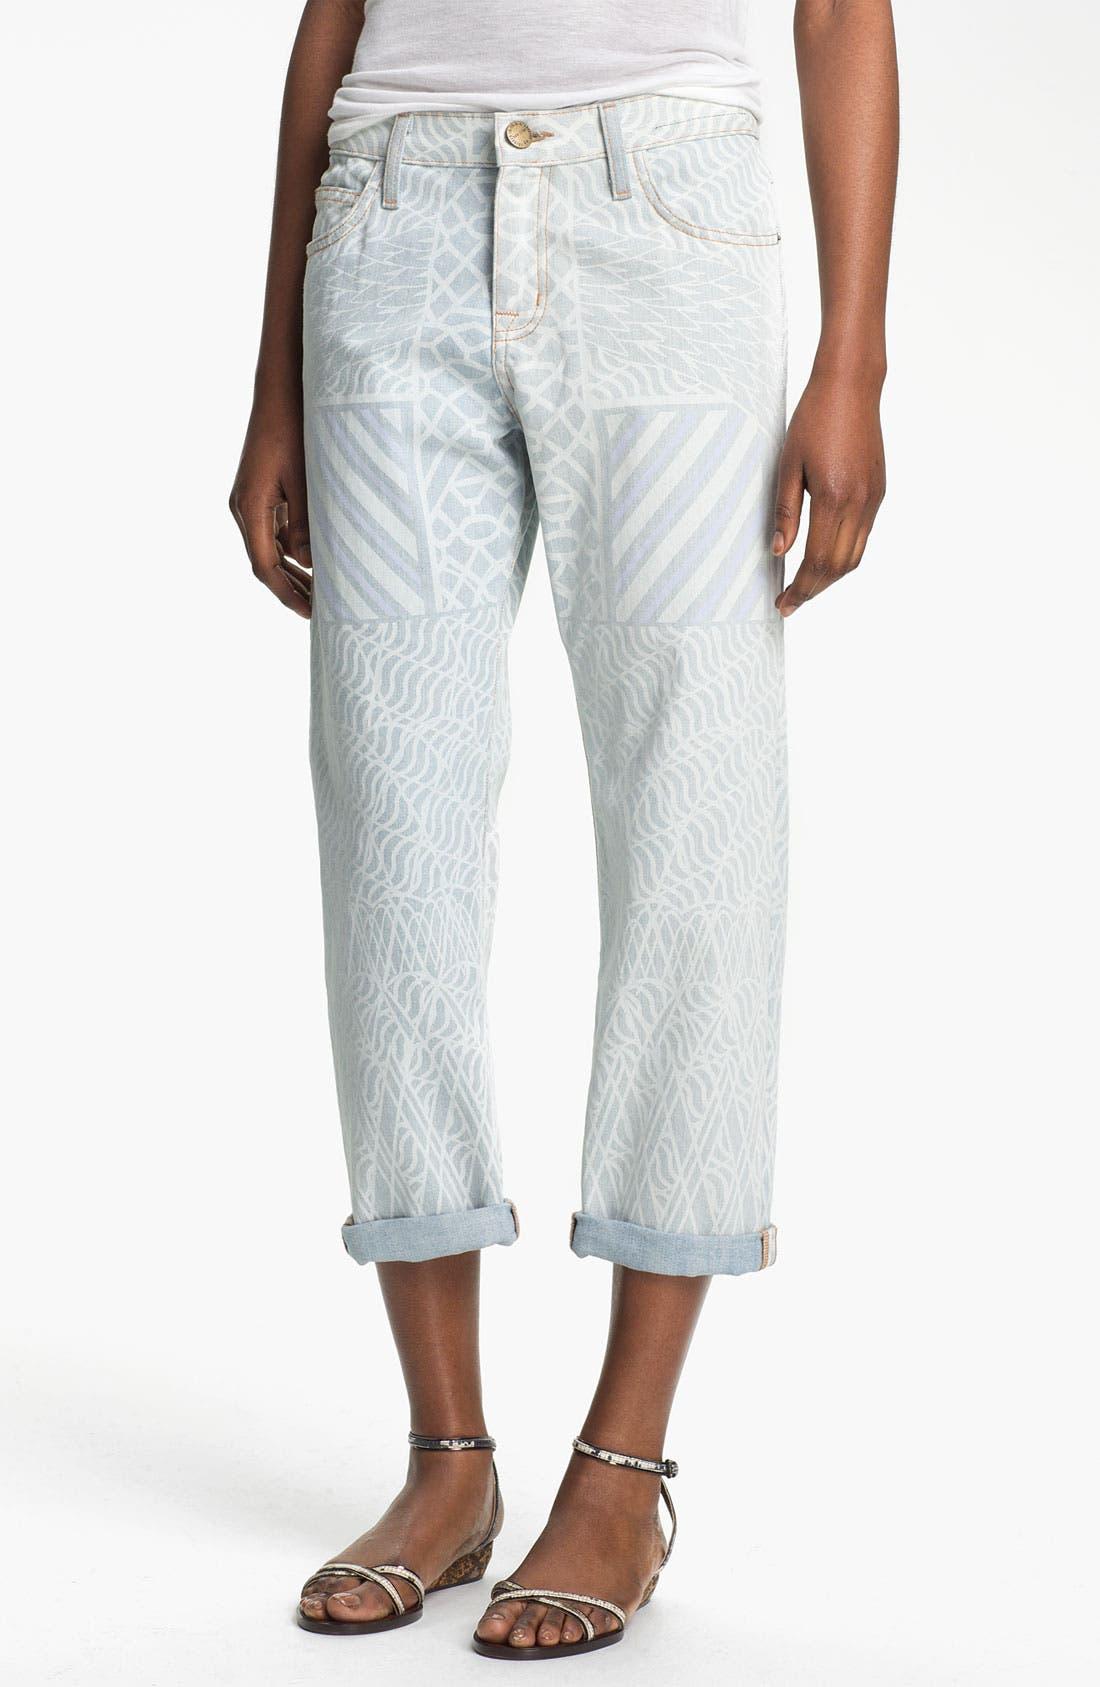 Alternate Image 1 Selected - Mary Katrantzou Current/Elliott 'The Boyfriend' Print Jeans